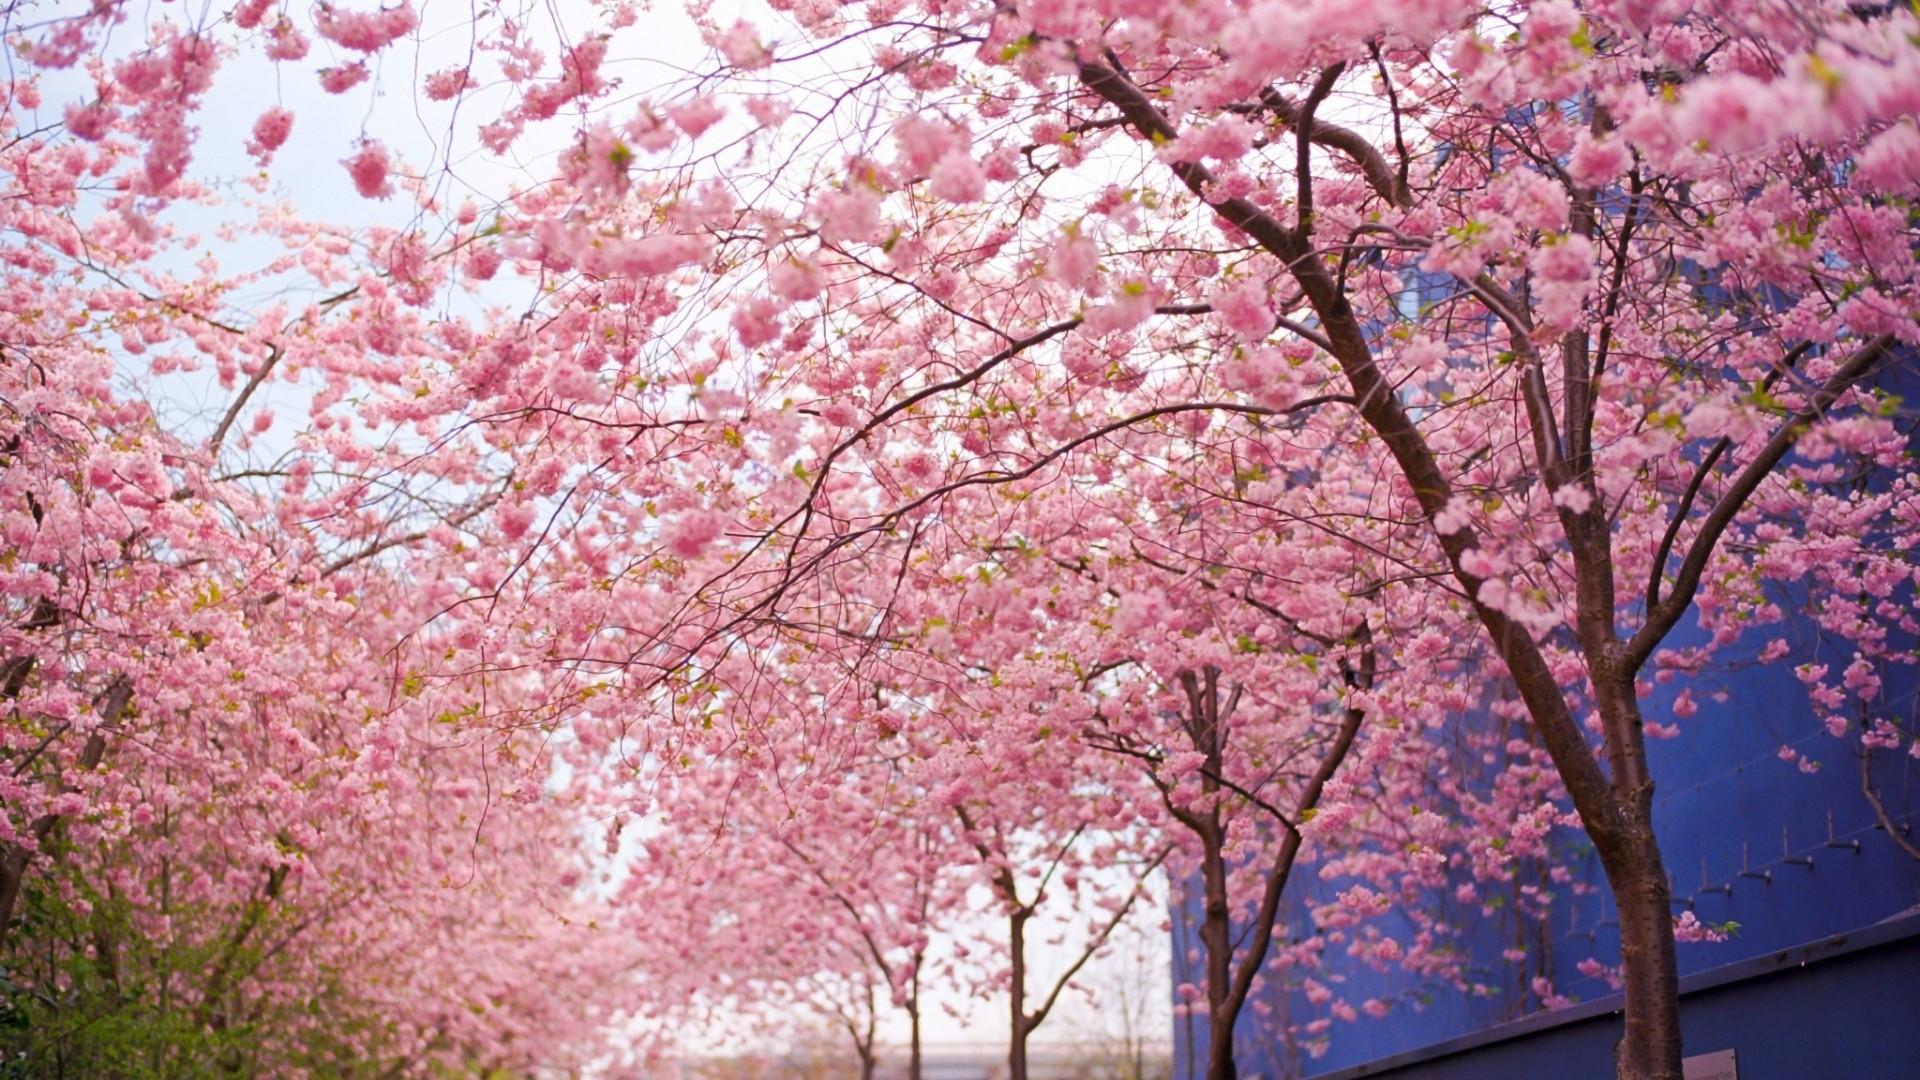 Japanese Cherry Blossom Wallpaper (71+ images)